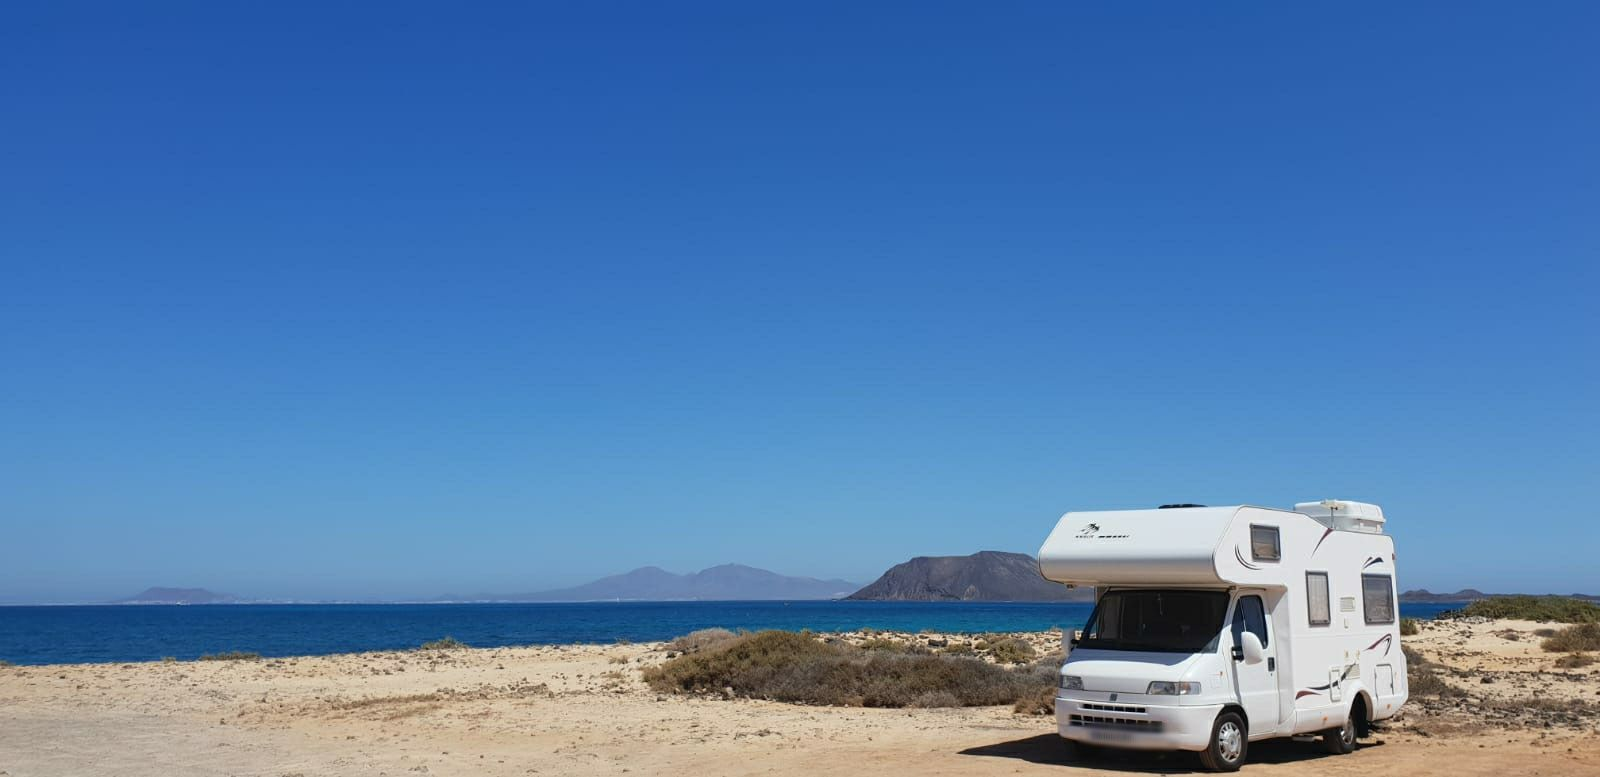 Caravana fuerteventura